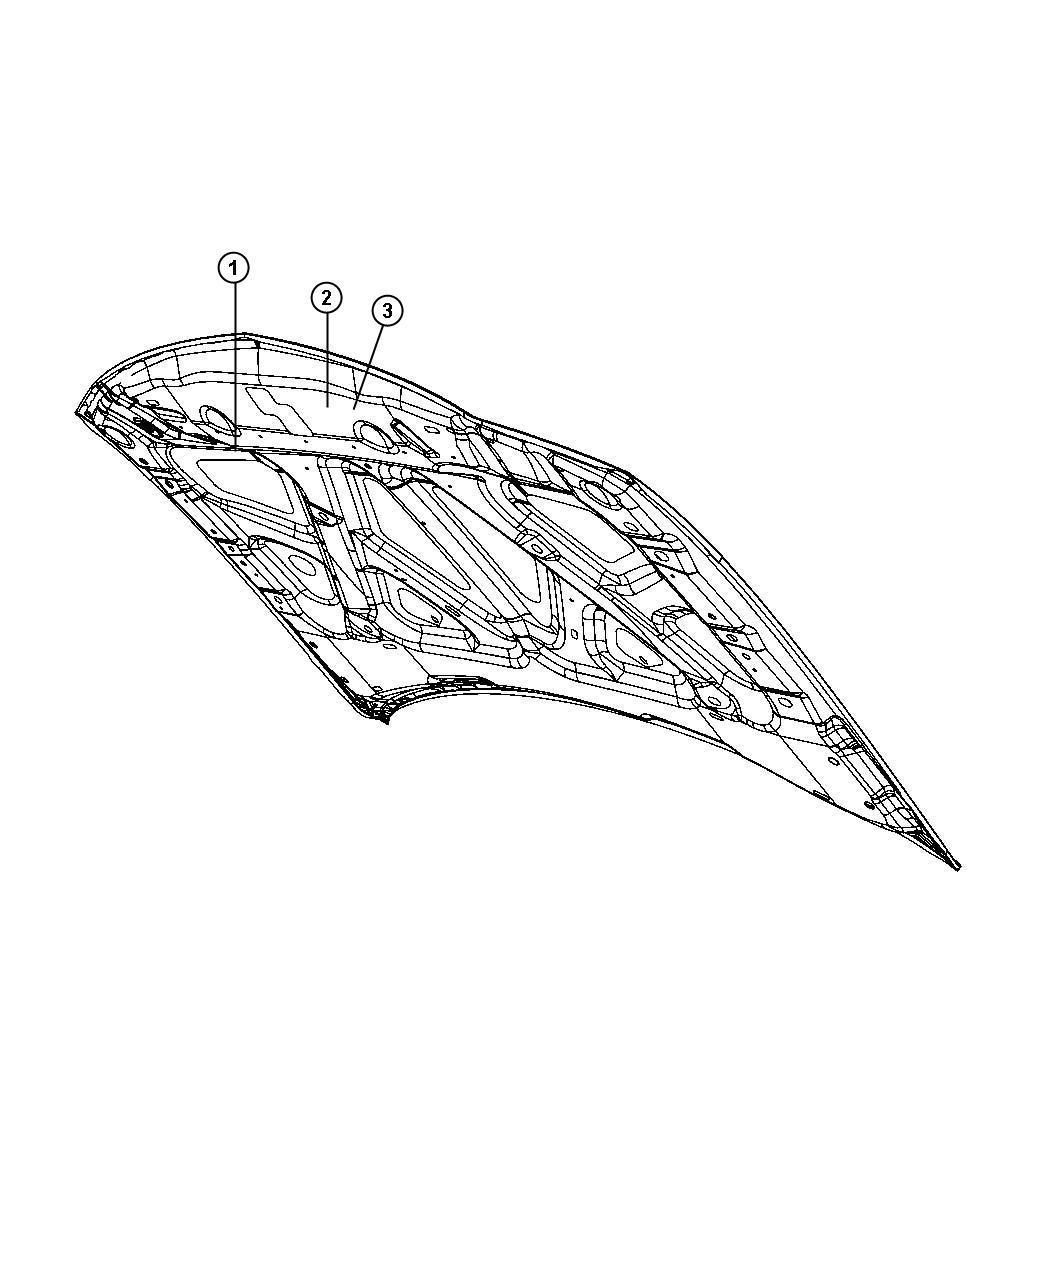 Ty 9554 Chrysler Sebring Engine Diagram Http Wwwjustanswercom Chrysler Schematic Wiring